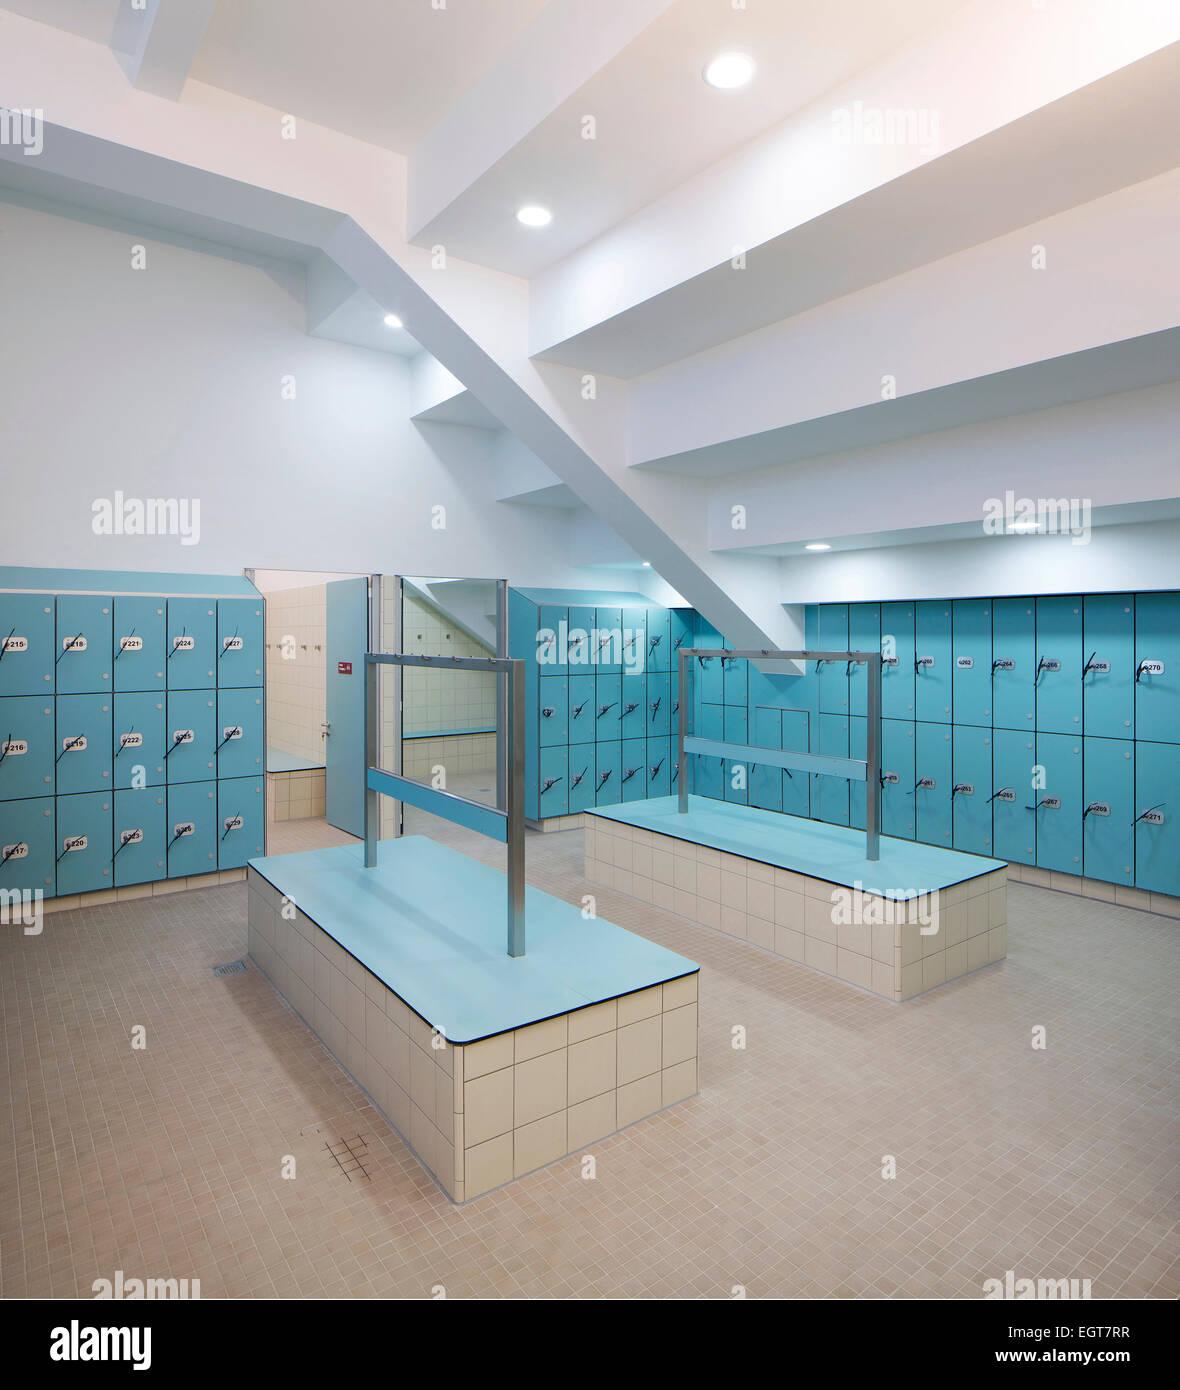 Ironmonger Row Baths Changing Rooms